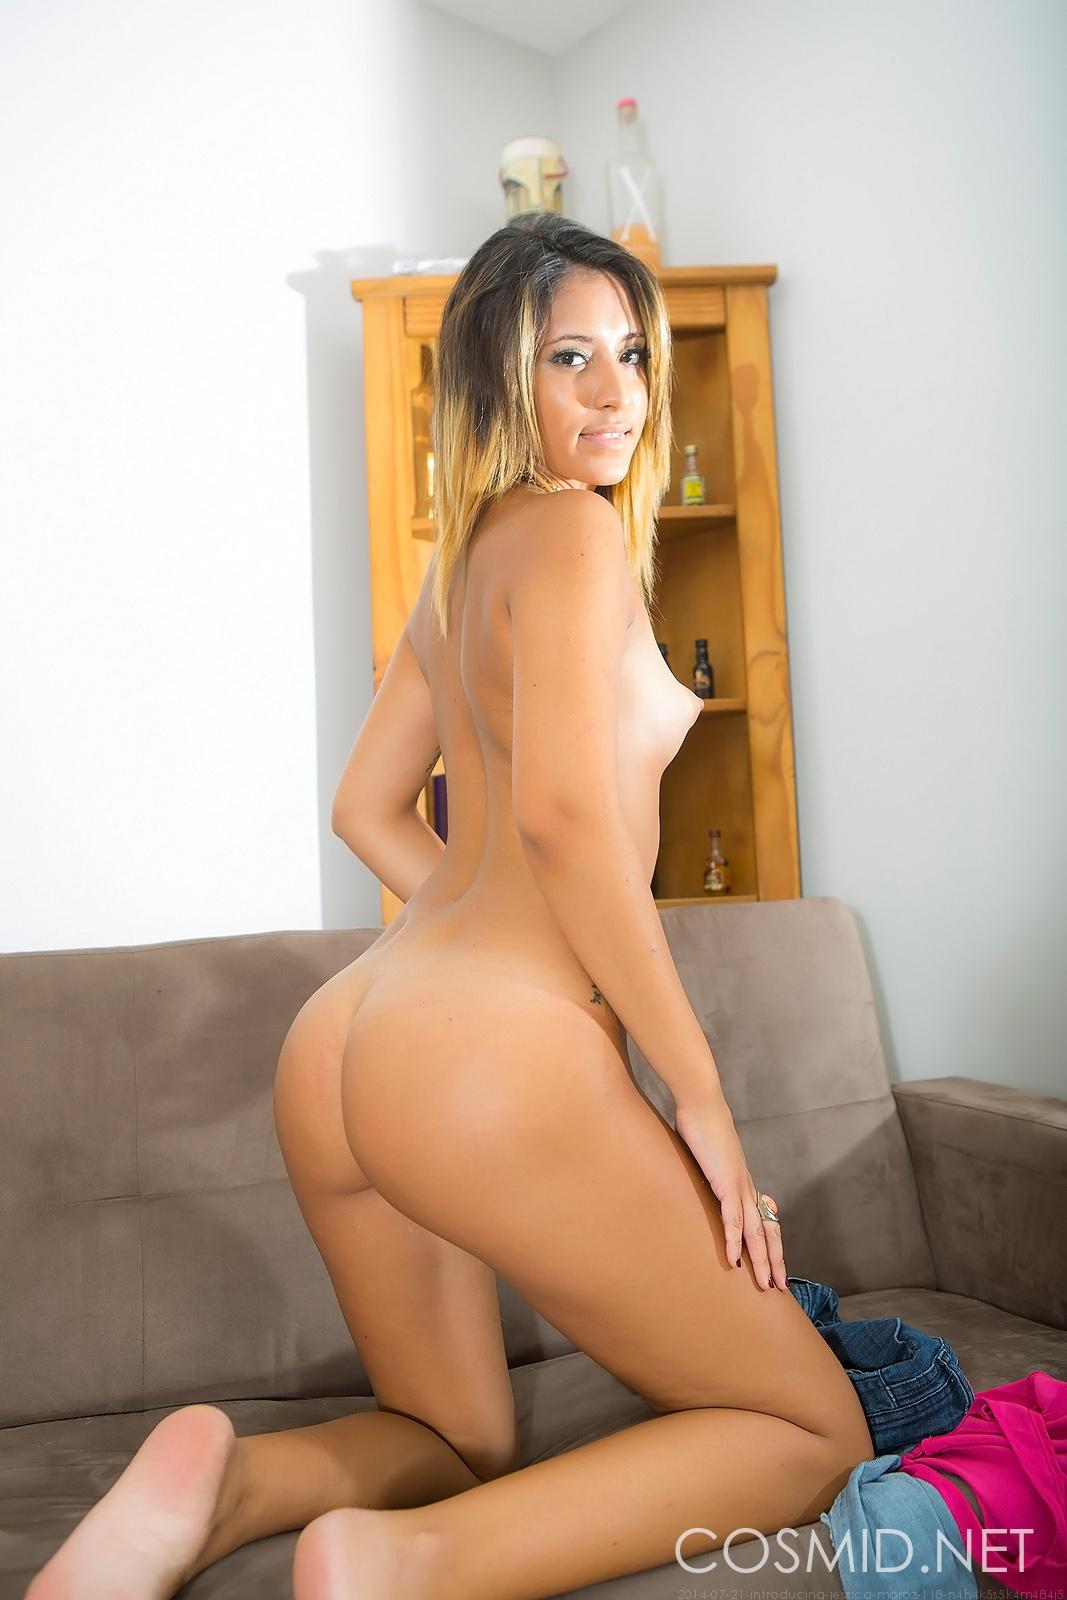 Apologise, but, Jessica latina nude something is